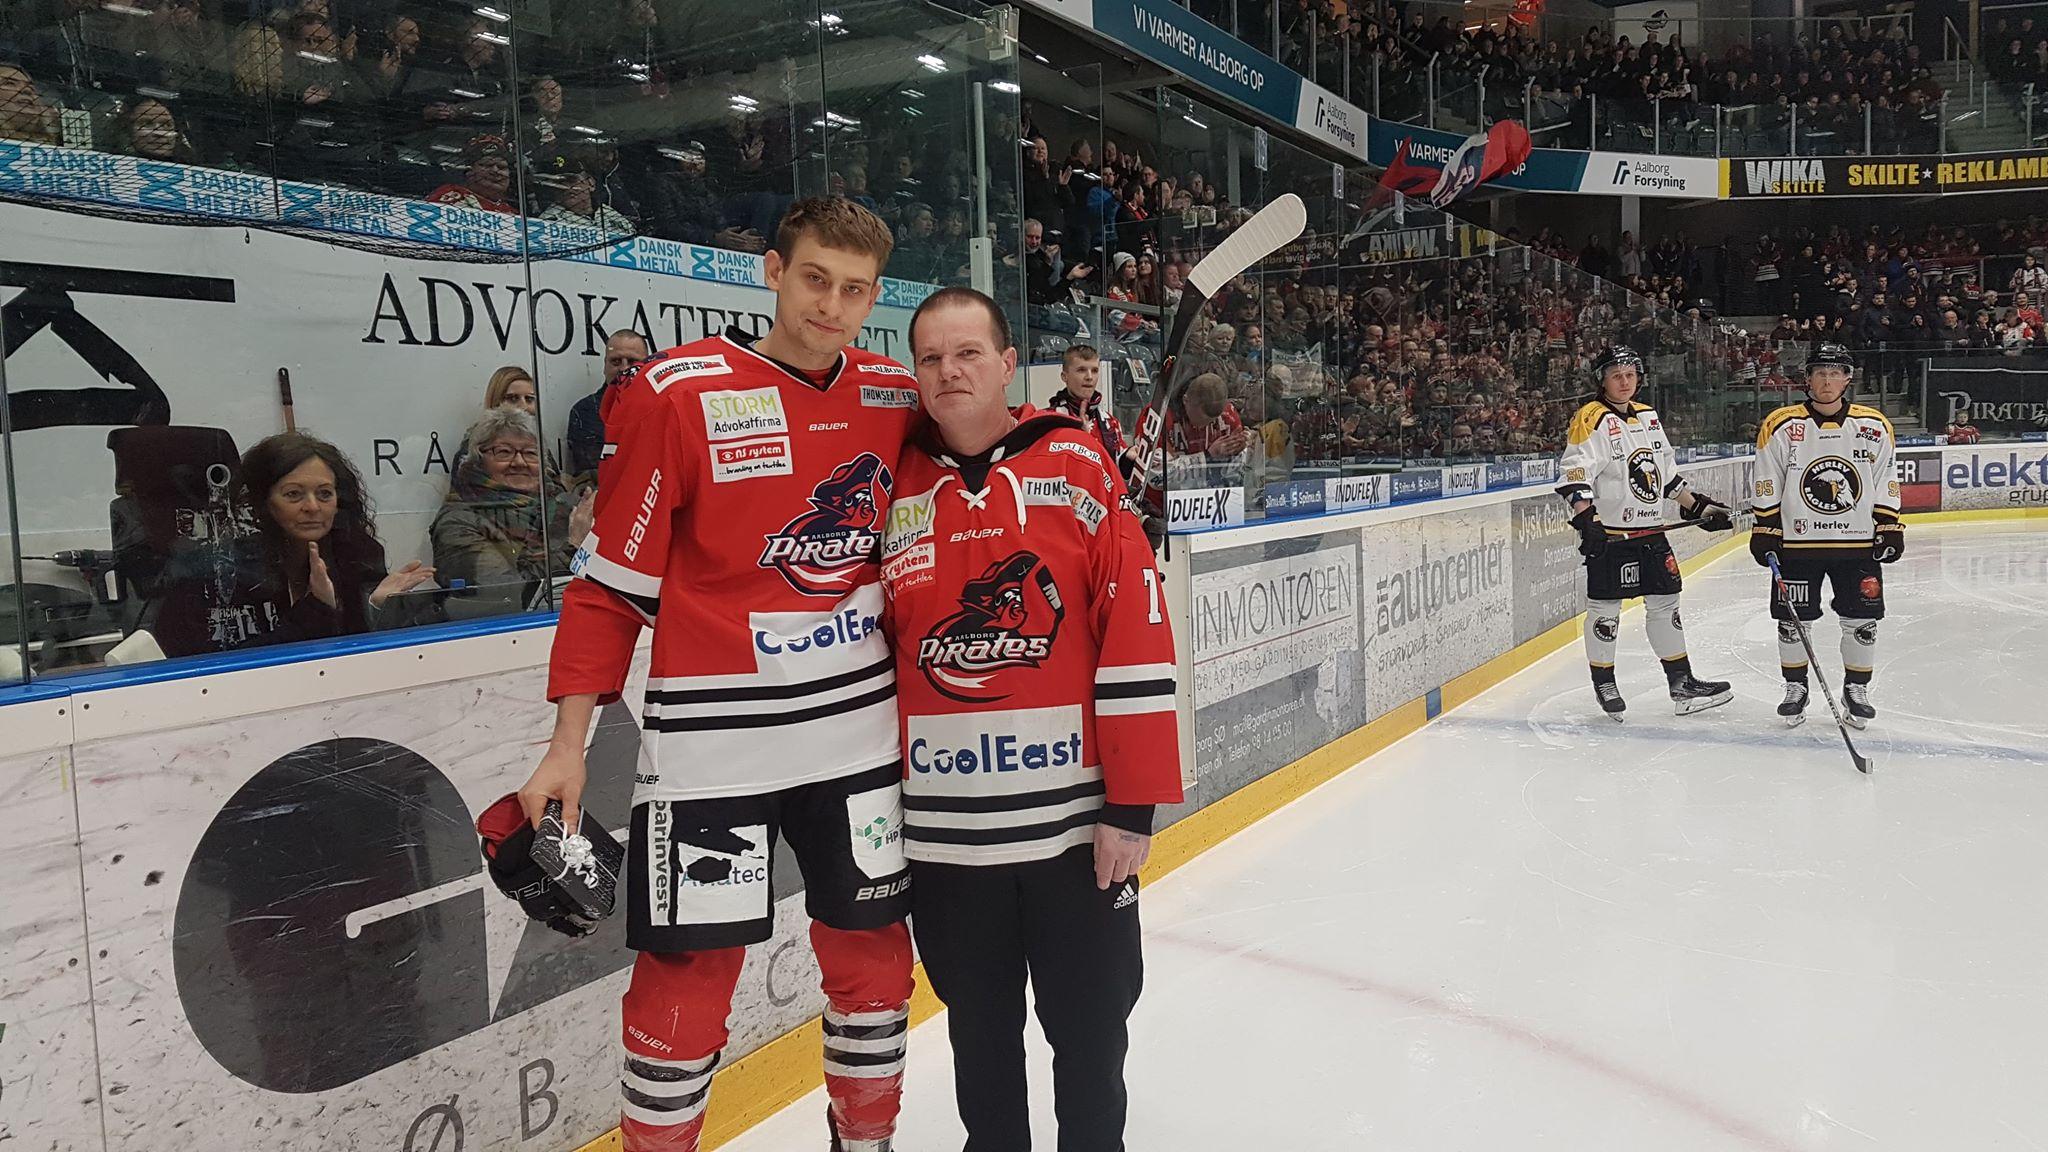 Månedens Spiller For December – #7 Kiril Kabanov